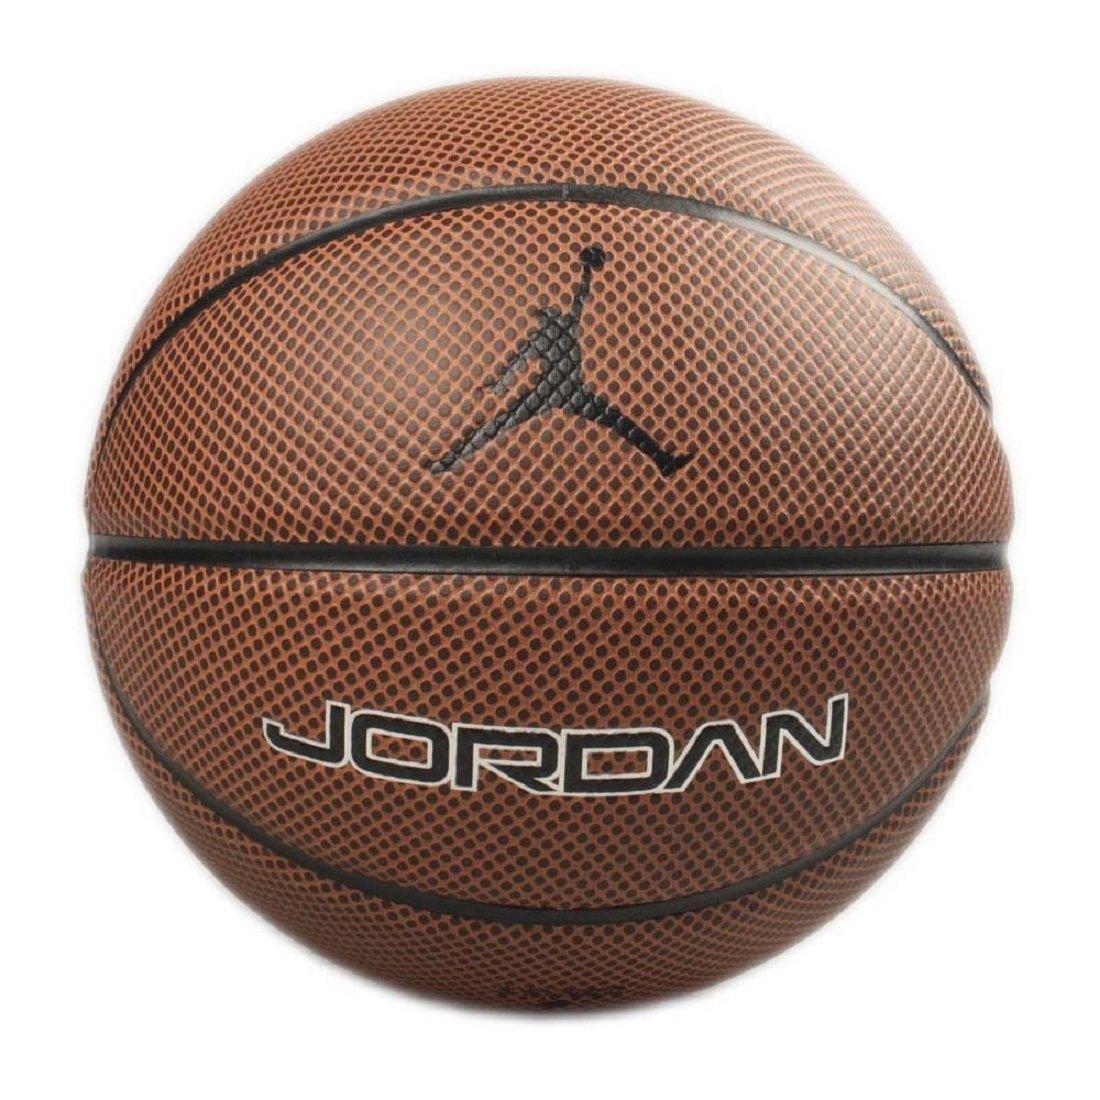 Unisex Adulto Nike Jordan Legacy 8P Pelota 7 Amber//Bla